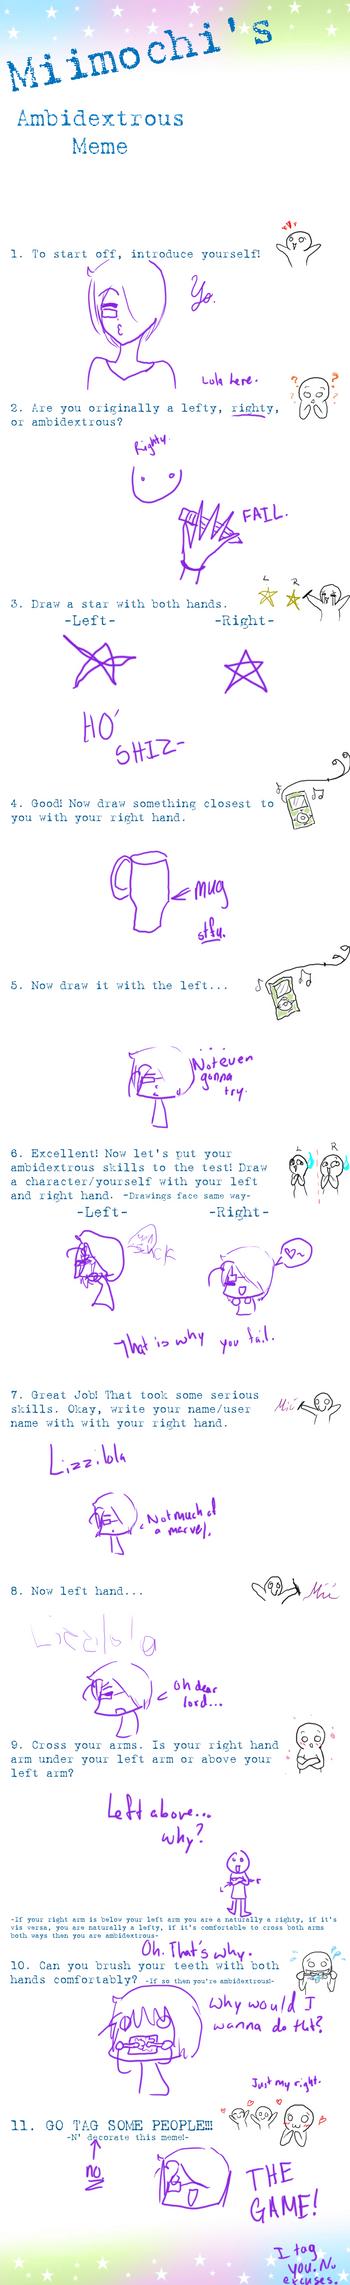 Ambidextrous Meme by Lizzilola